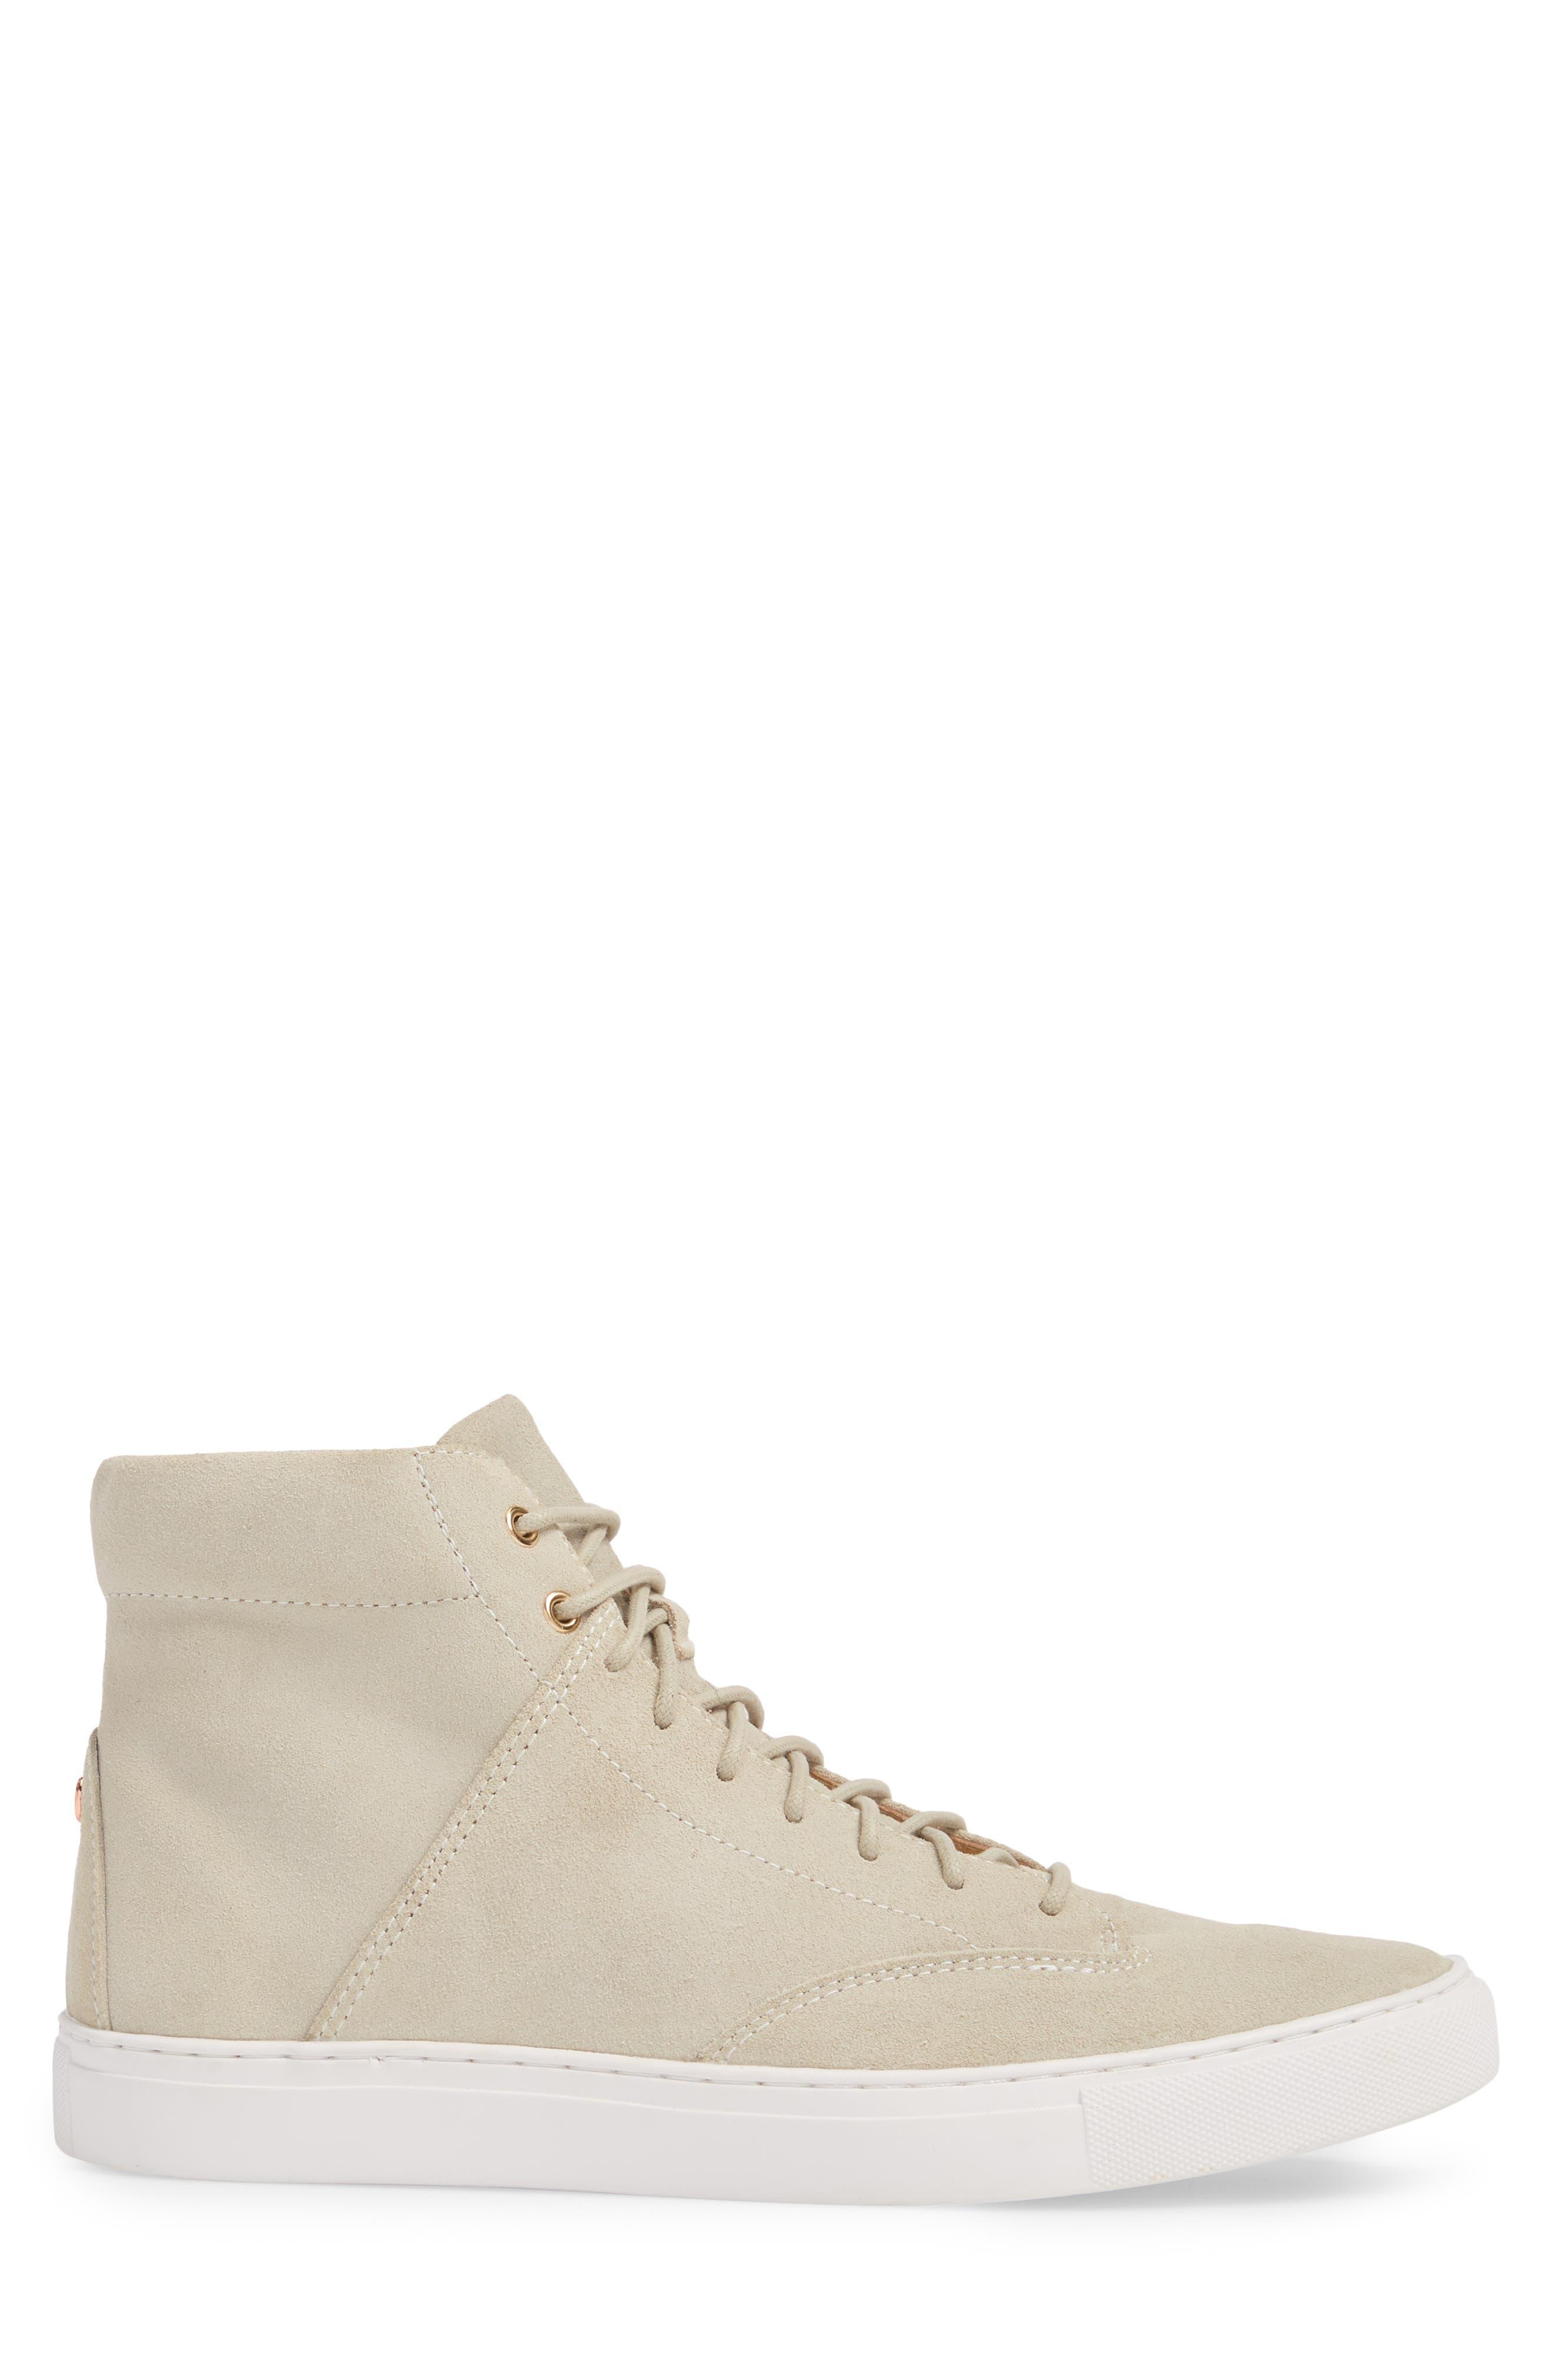 'Porter' High Top Sneaker,                             Alternate thumbnail 3, color,                             Quartz Leather